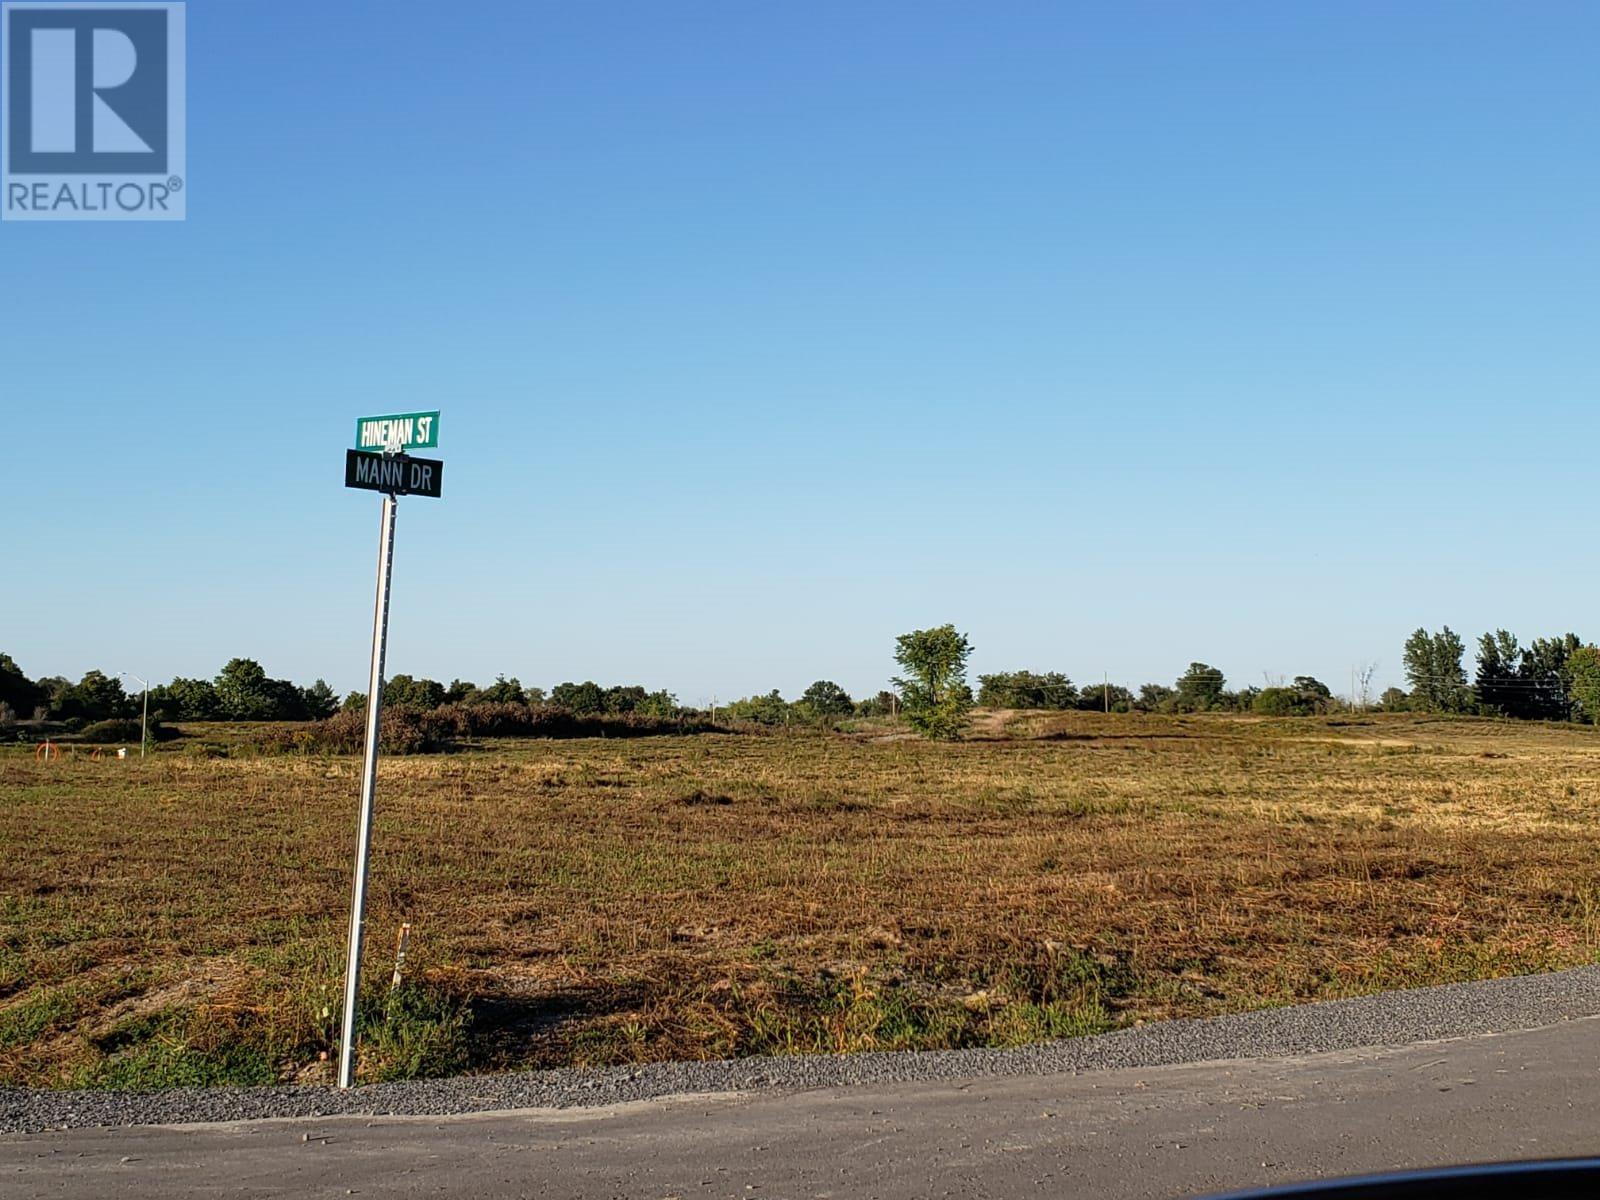 Property Listing: 213 Mann Drive, Kingston, Ontario